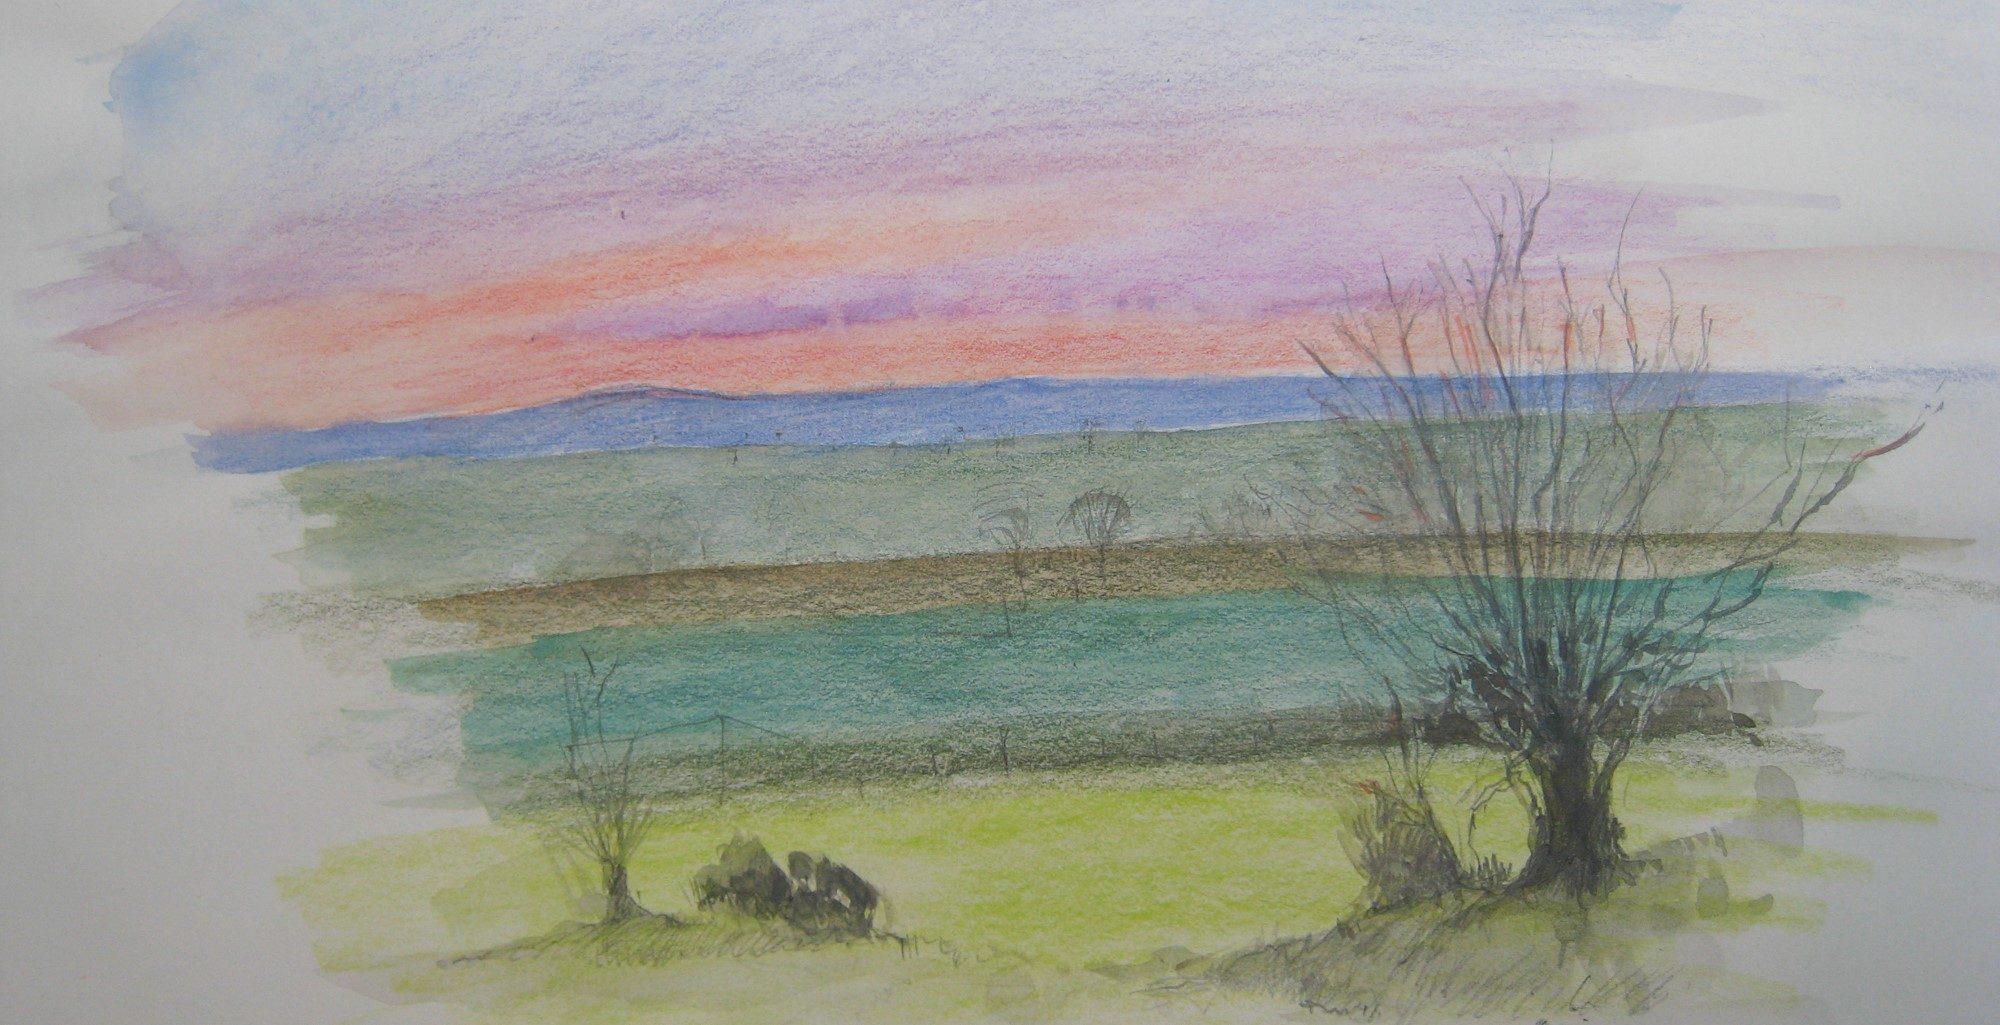 Germansweek view rainbow sunrise over Dartmoor